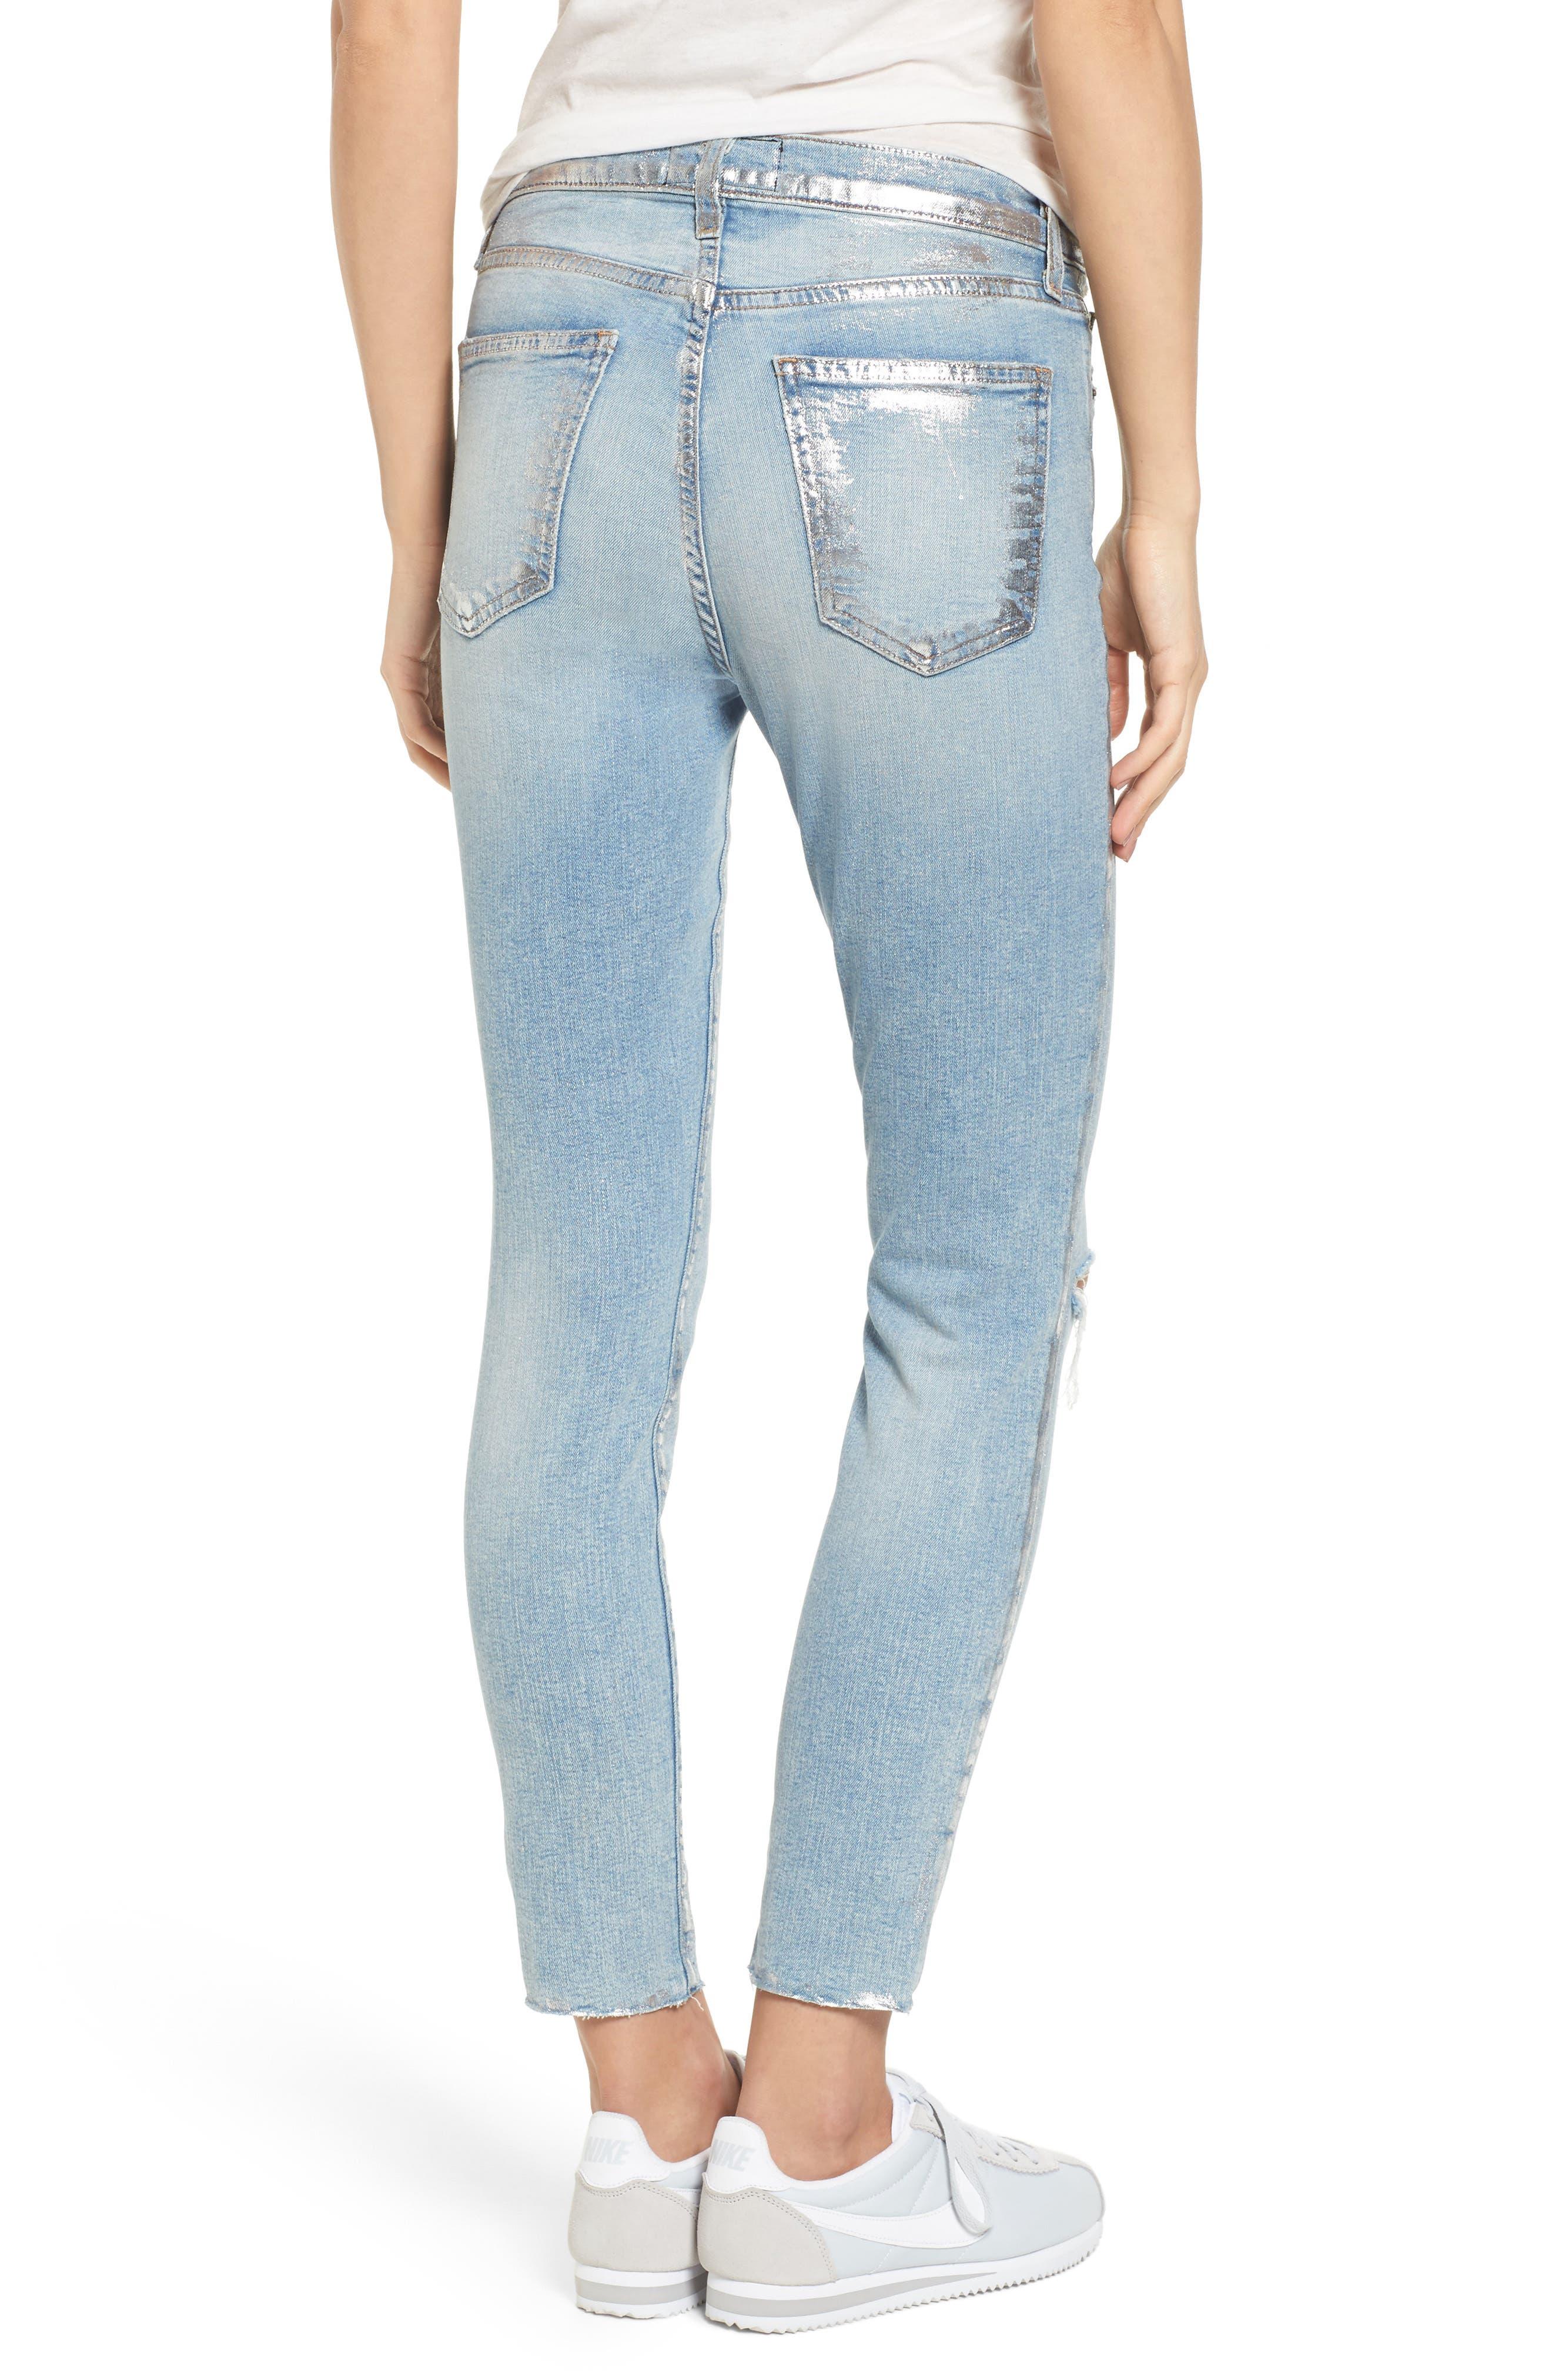 The Stiletto High Waist Skinny Jeans,                             Alternate thumbnail 2, color,                             Seville Destroy/ Foil